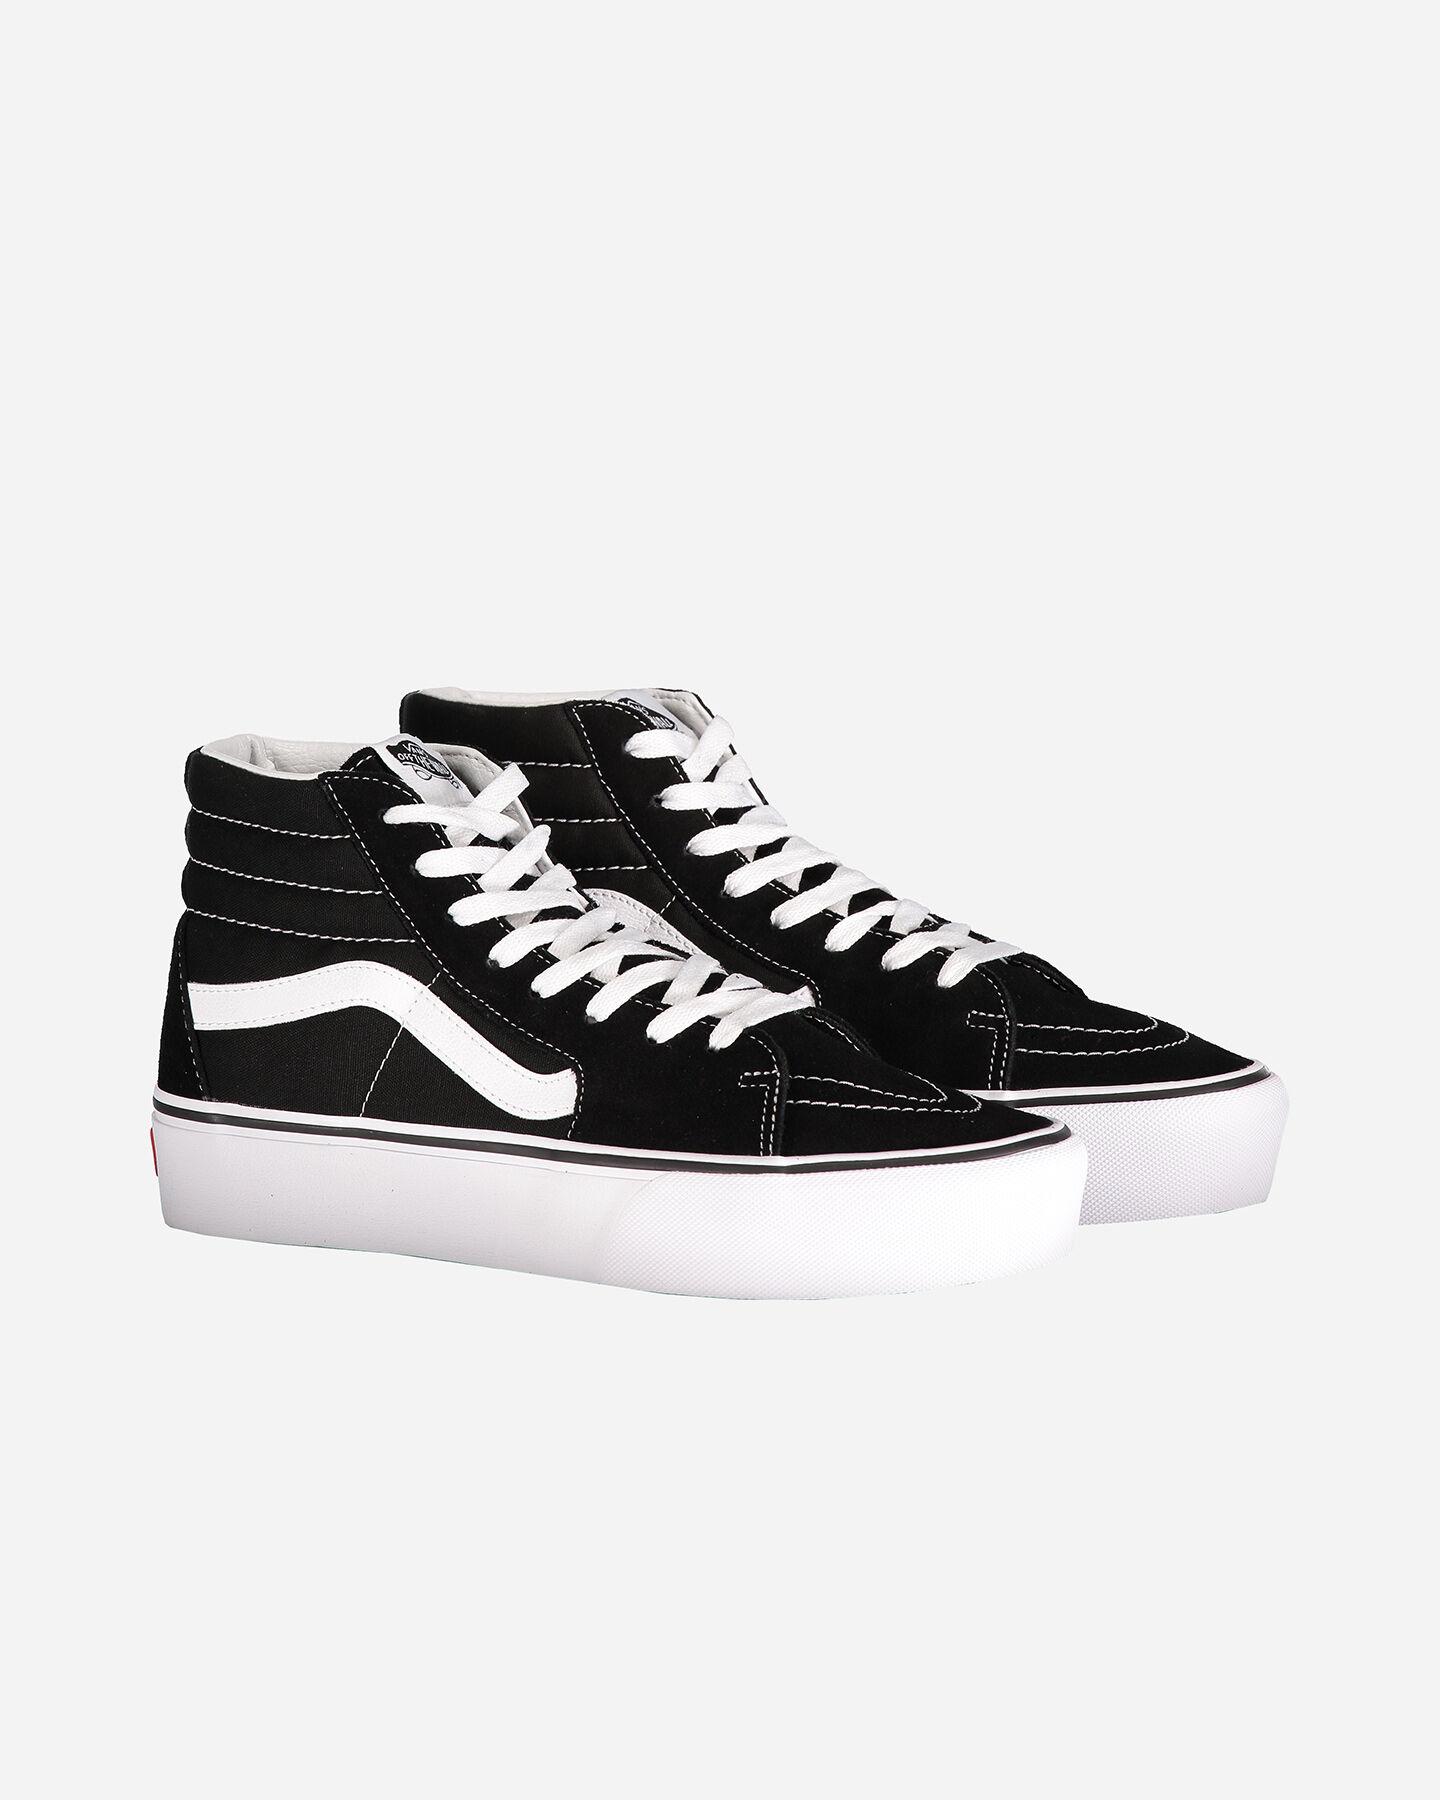 Scarpe sneakers VANS SK8-HI PLATFORM 2.0  W S4053273 scatto 1